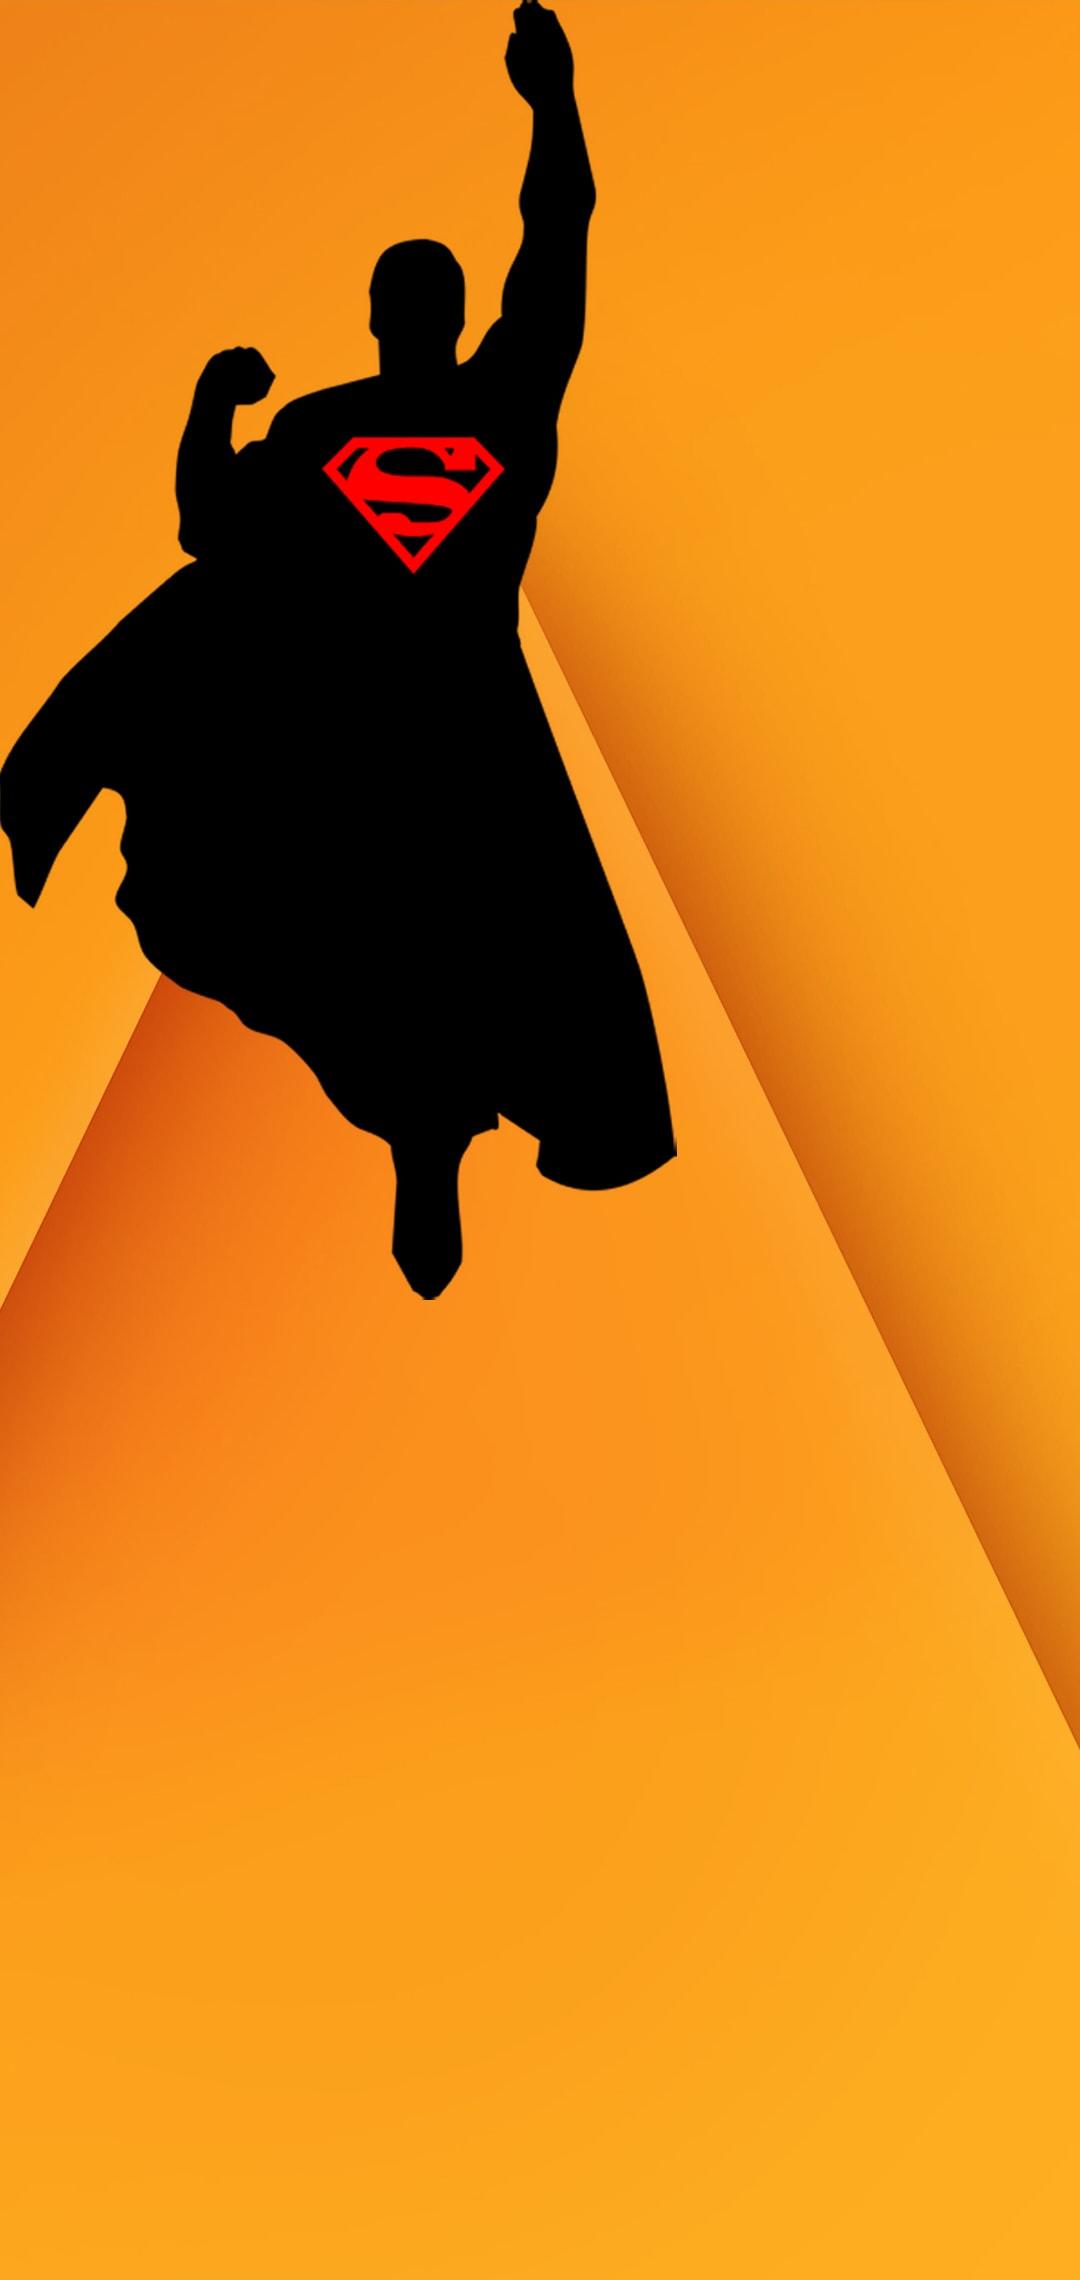 hole punch walls superman black